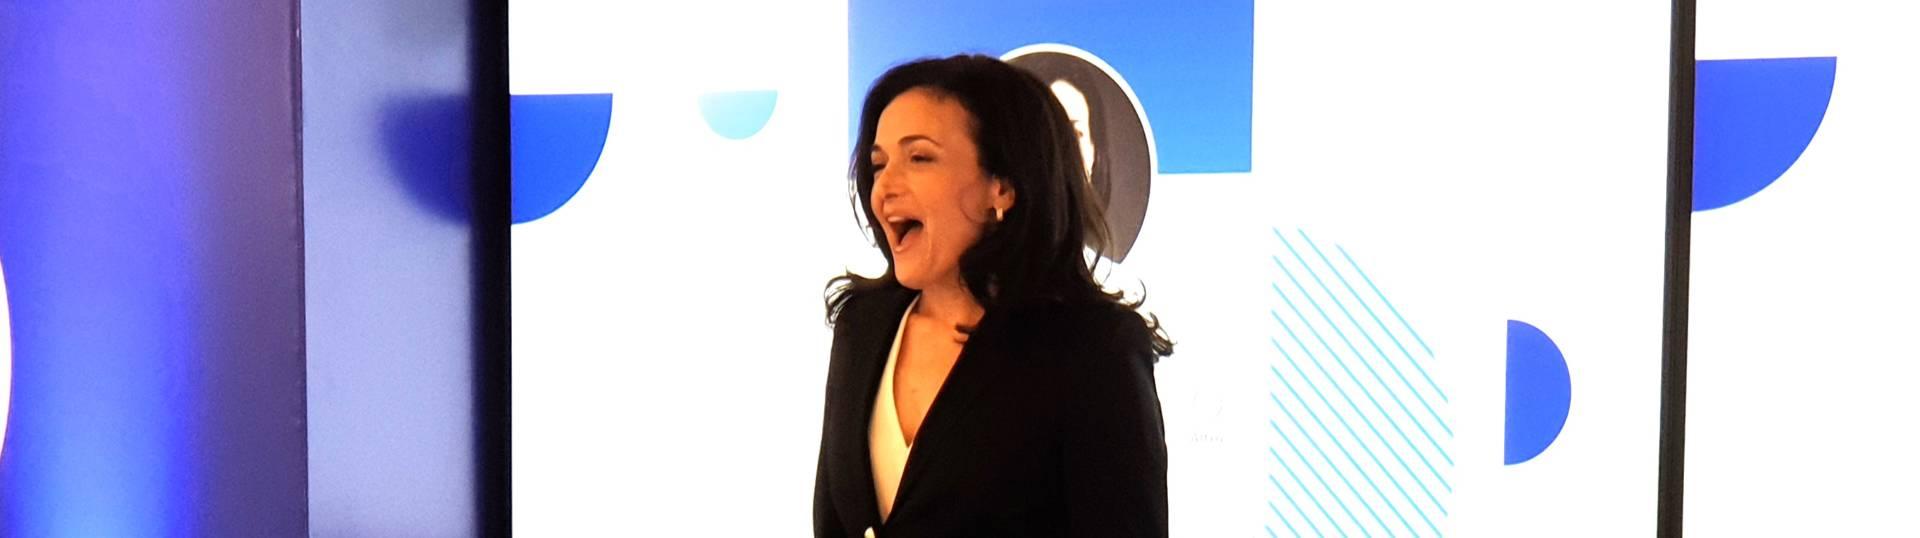 Sheryl Sandberg: Facebook investe in Italia e combatte le fake news